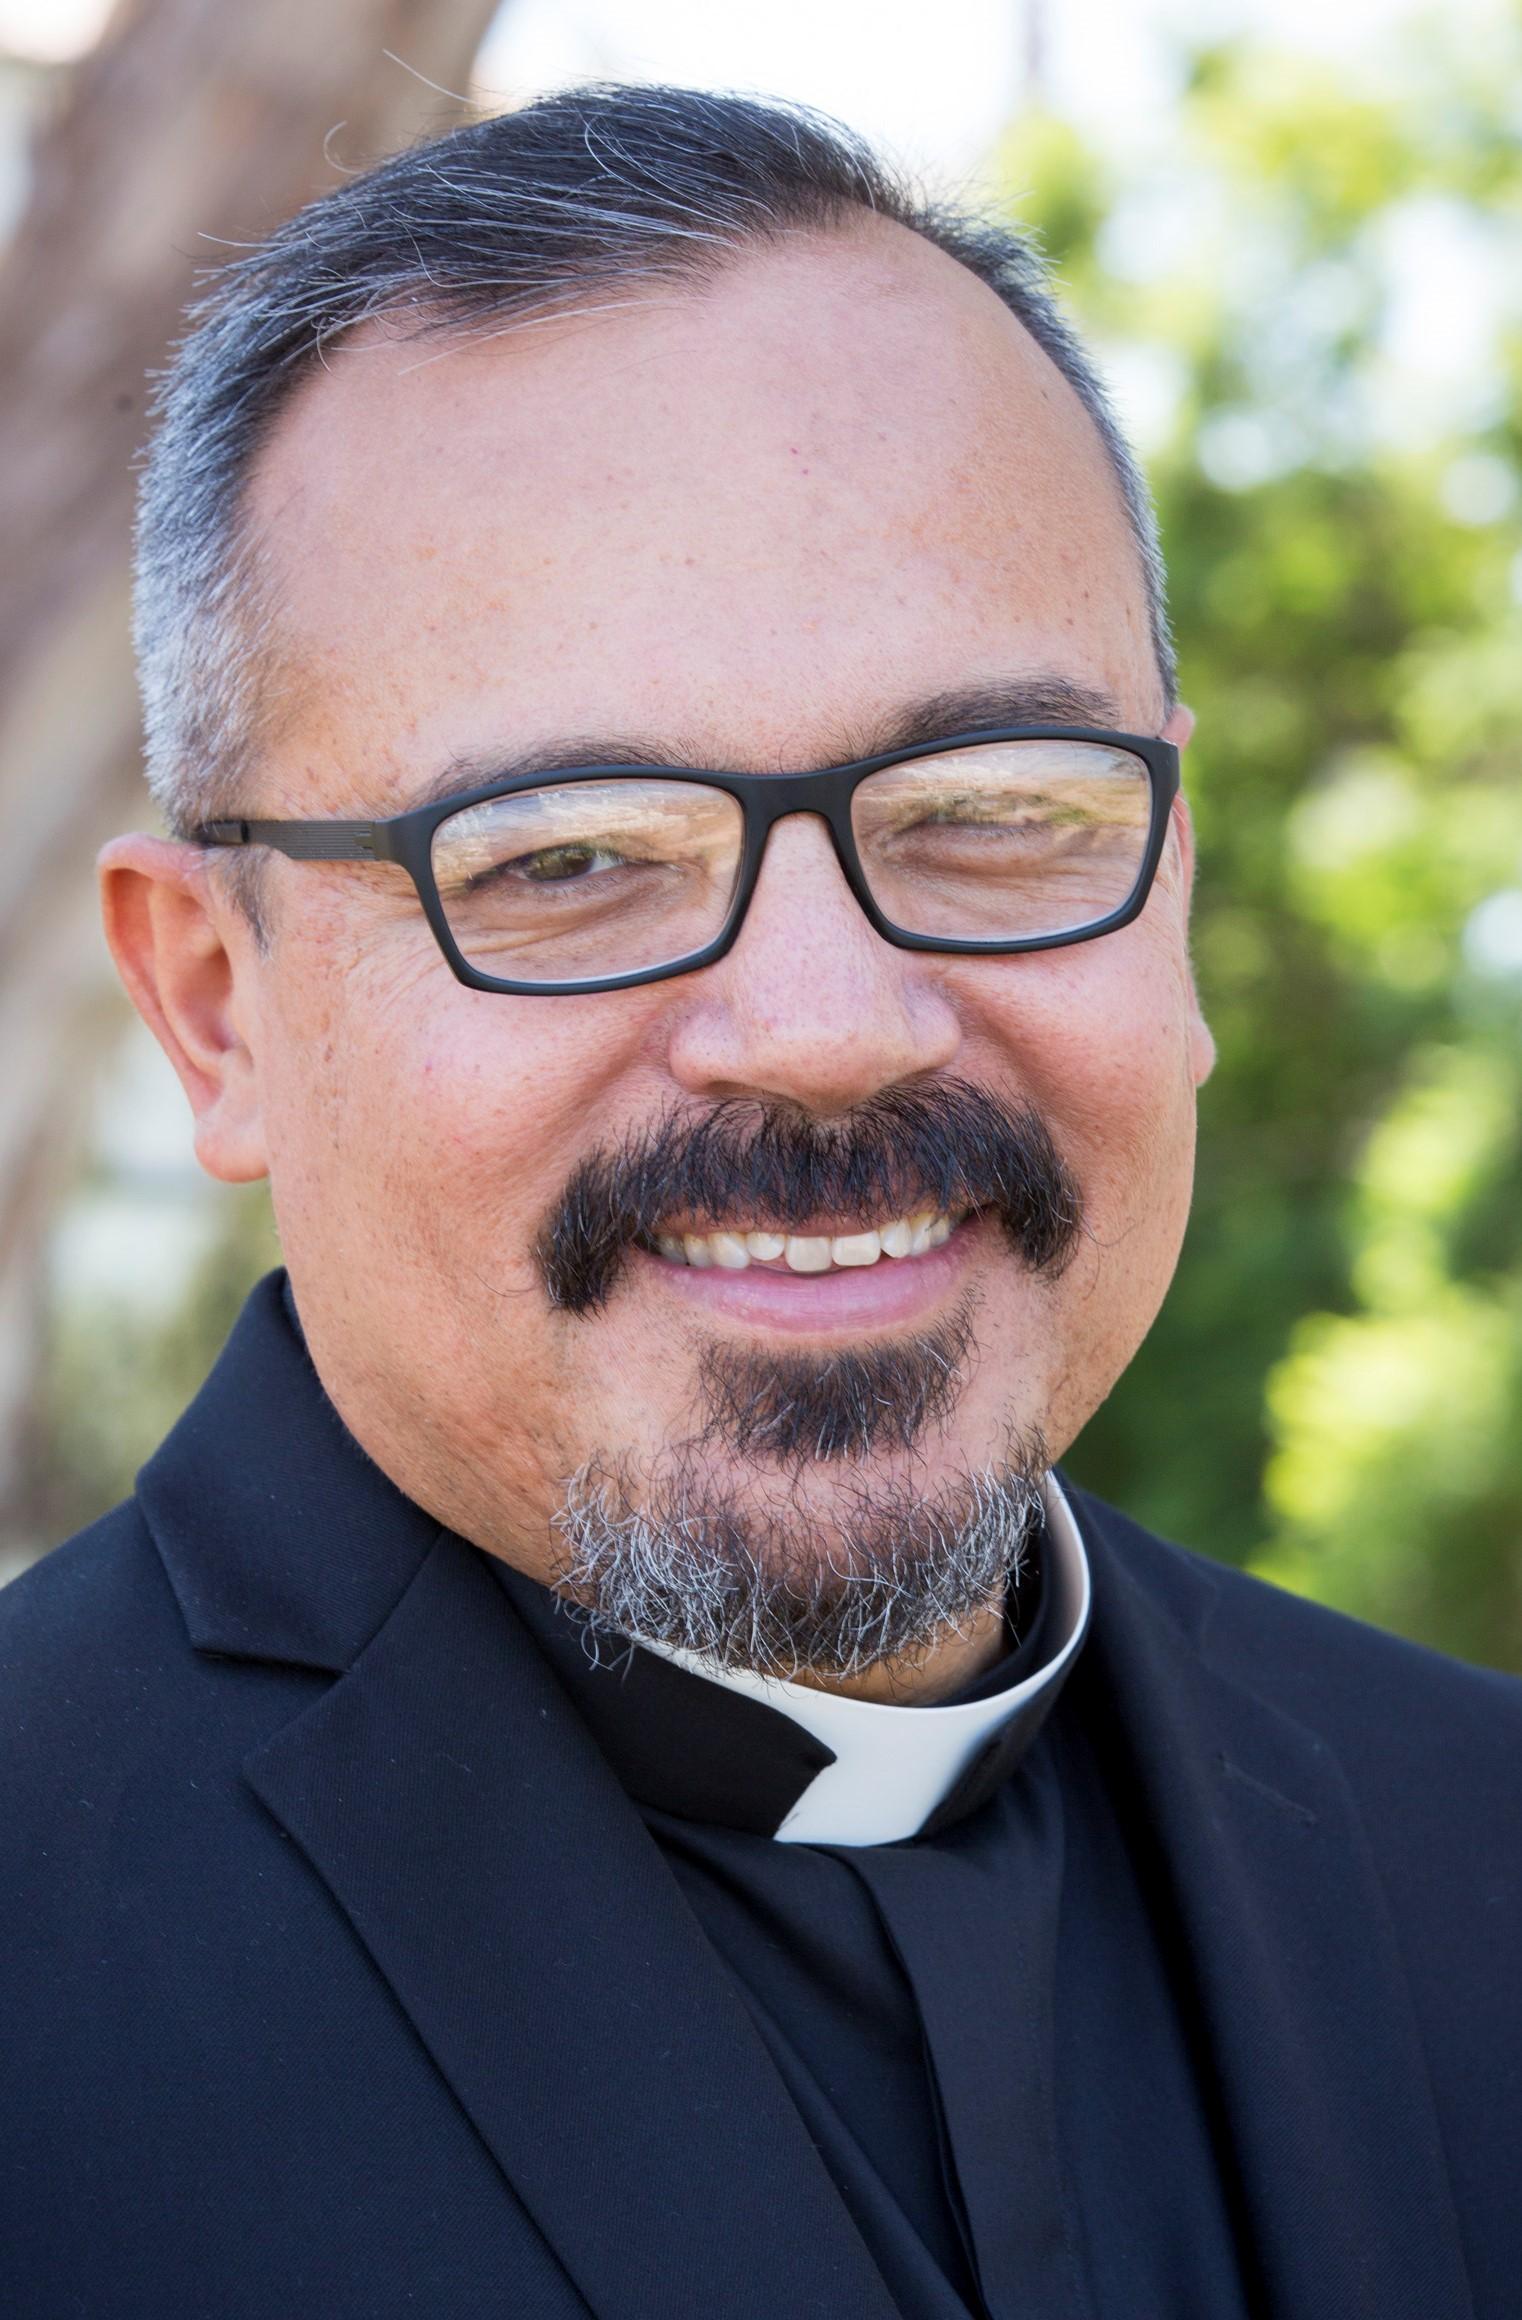 Chaplain Manny